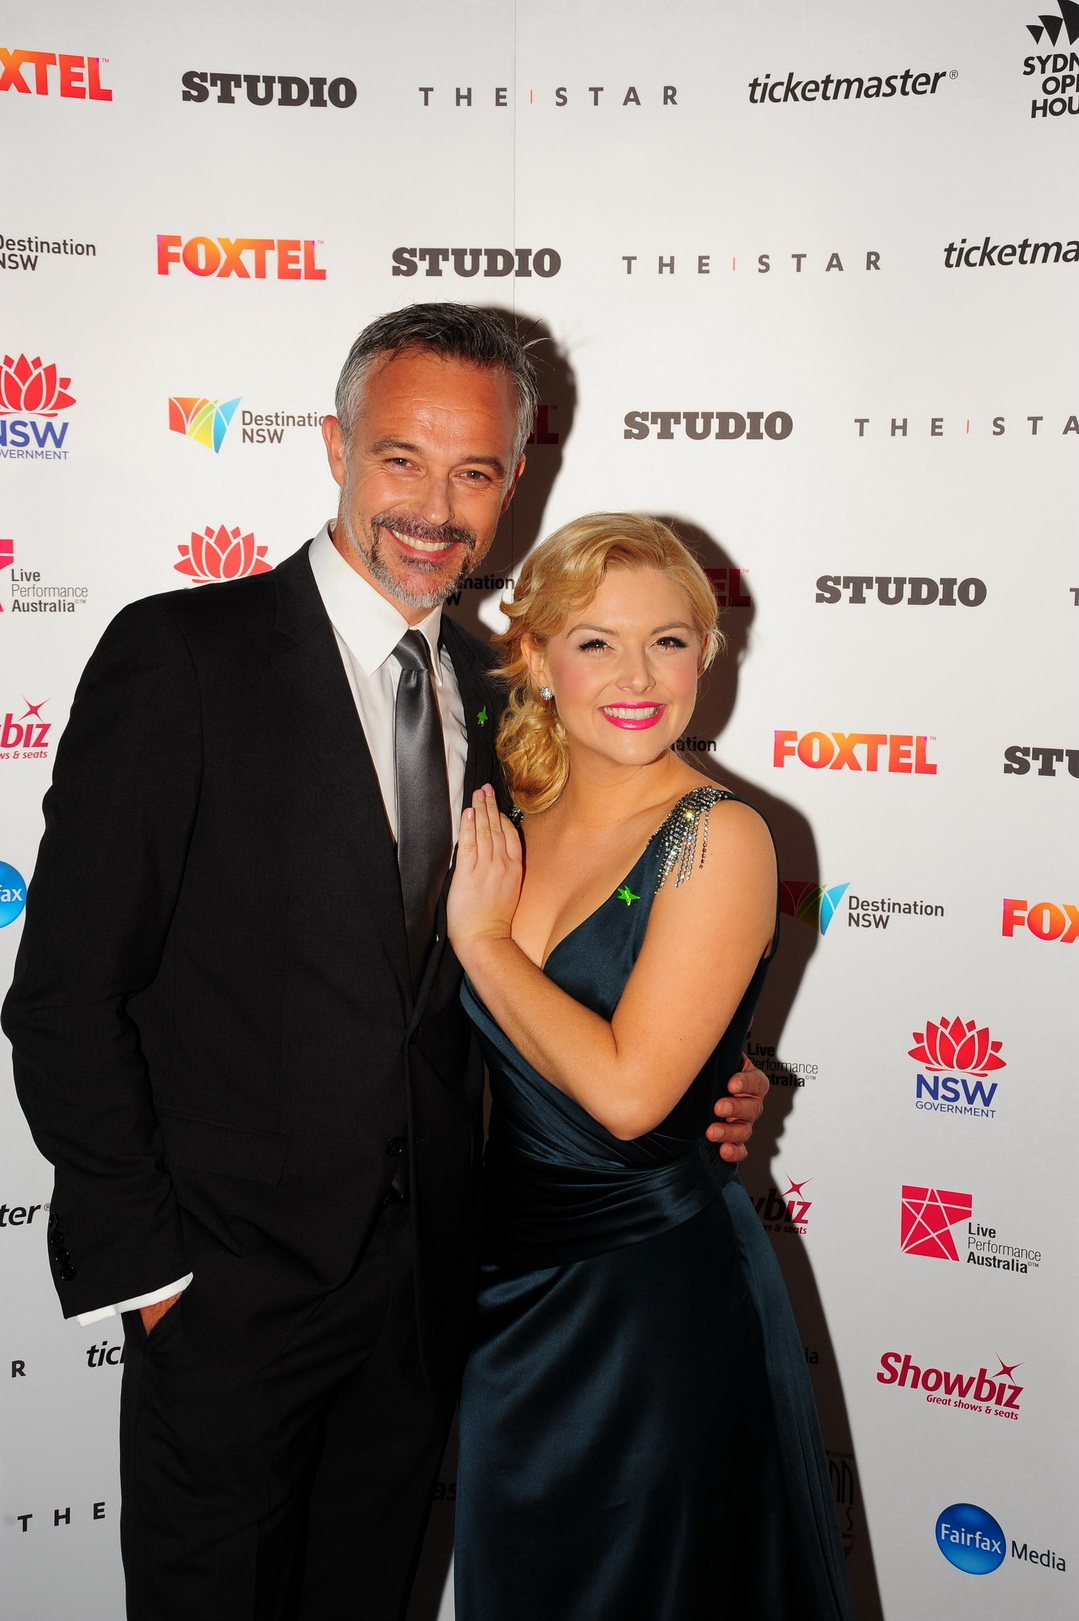 Helpmann Awards - Cameron Daddo and Lucy Durack Helpmann Awards Photo James Morgan _7460